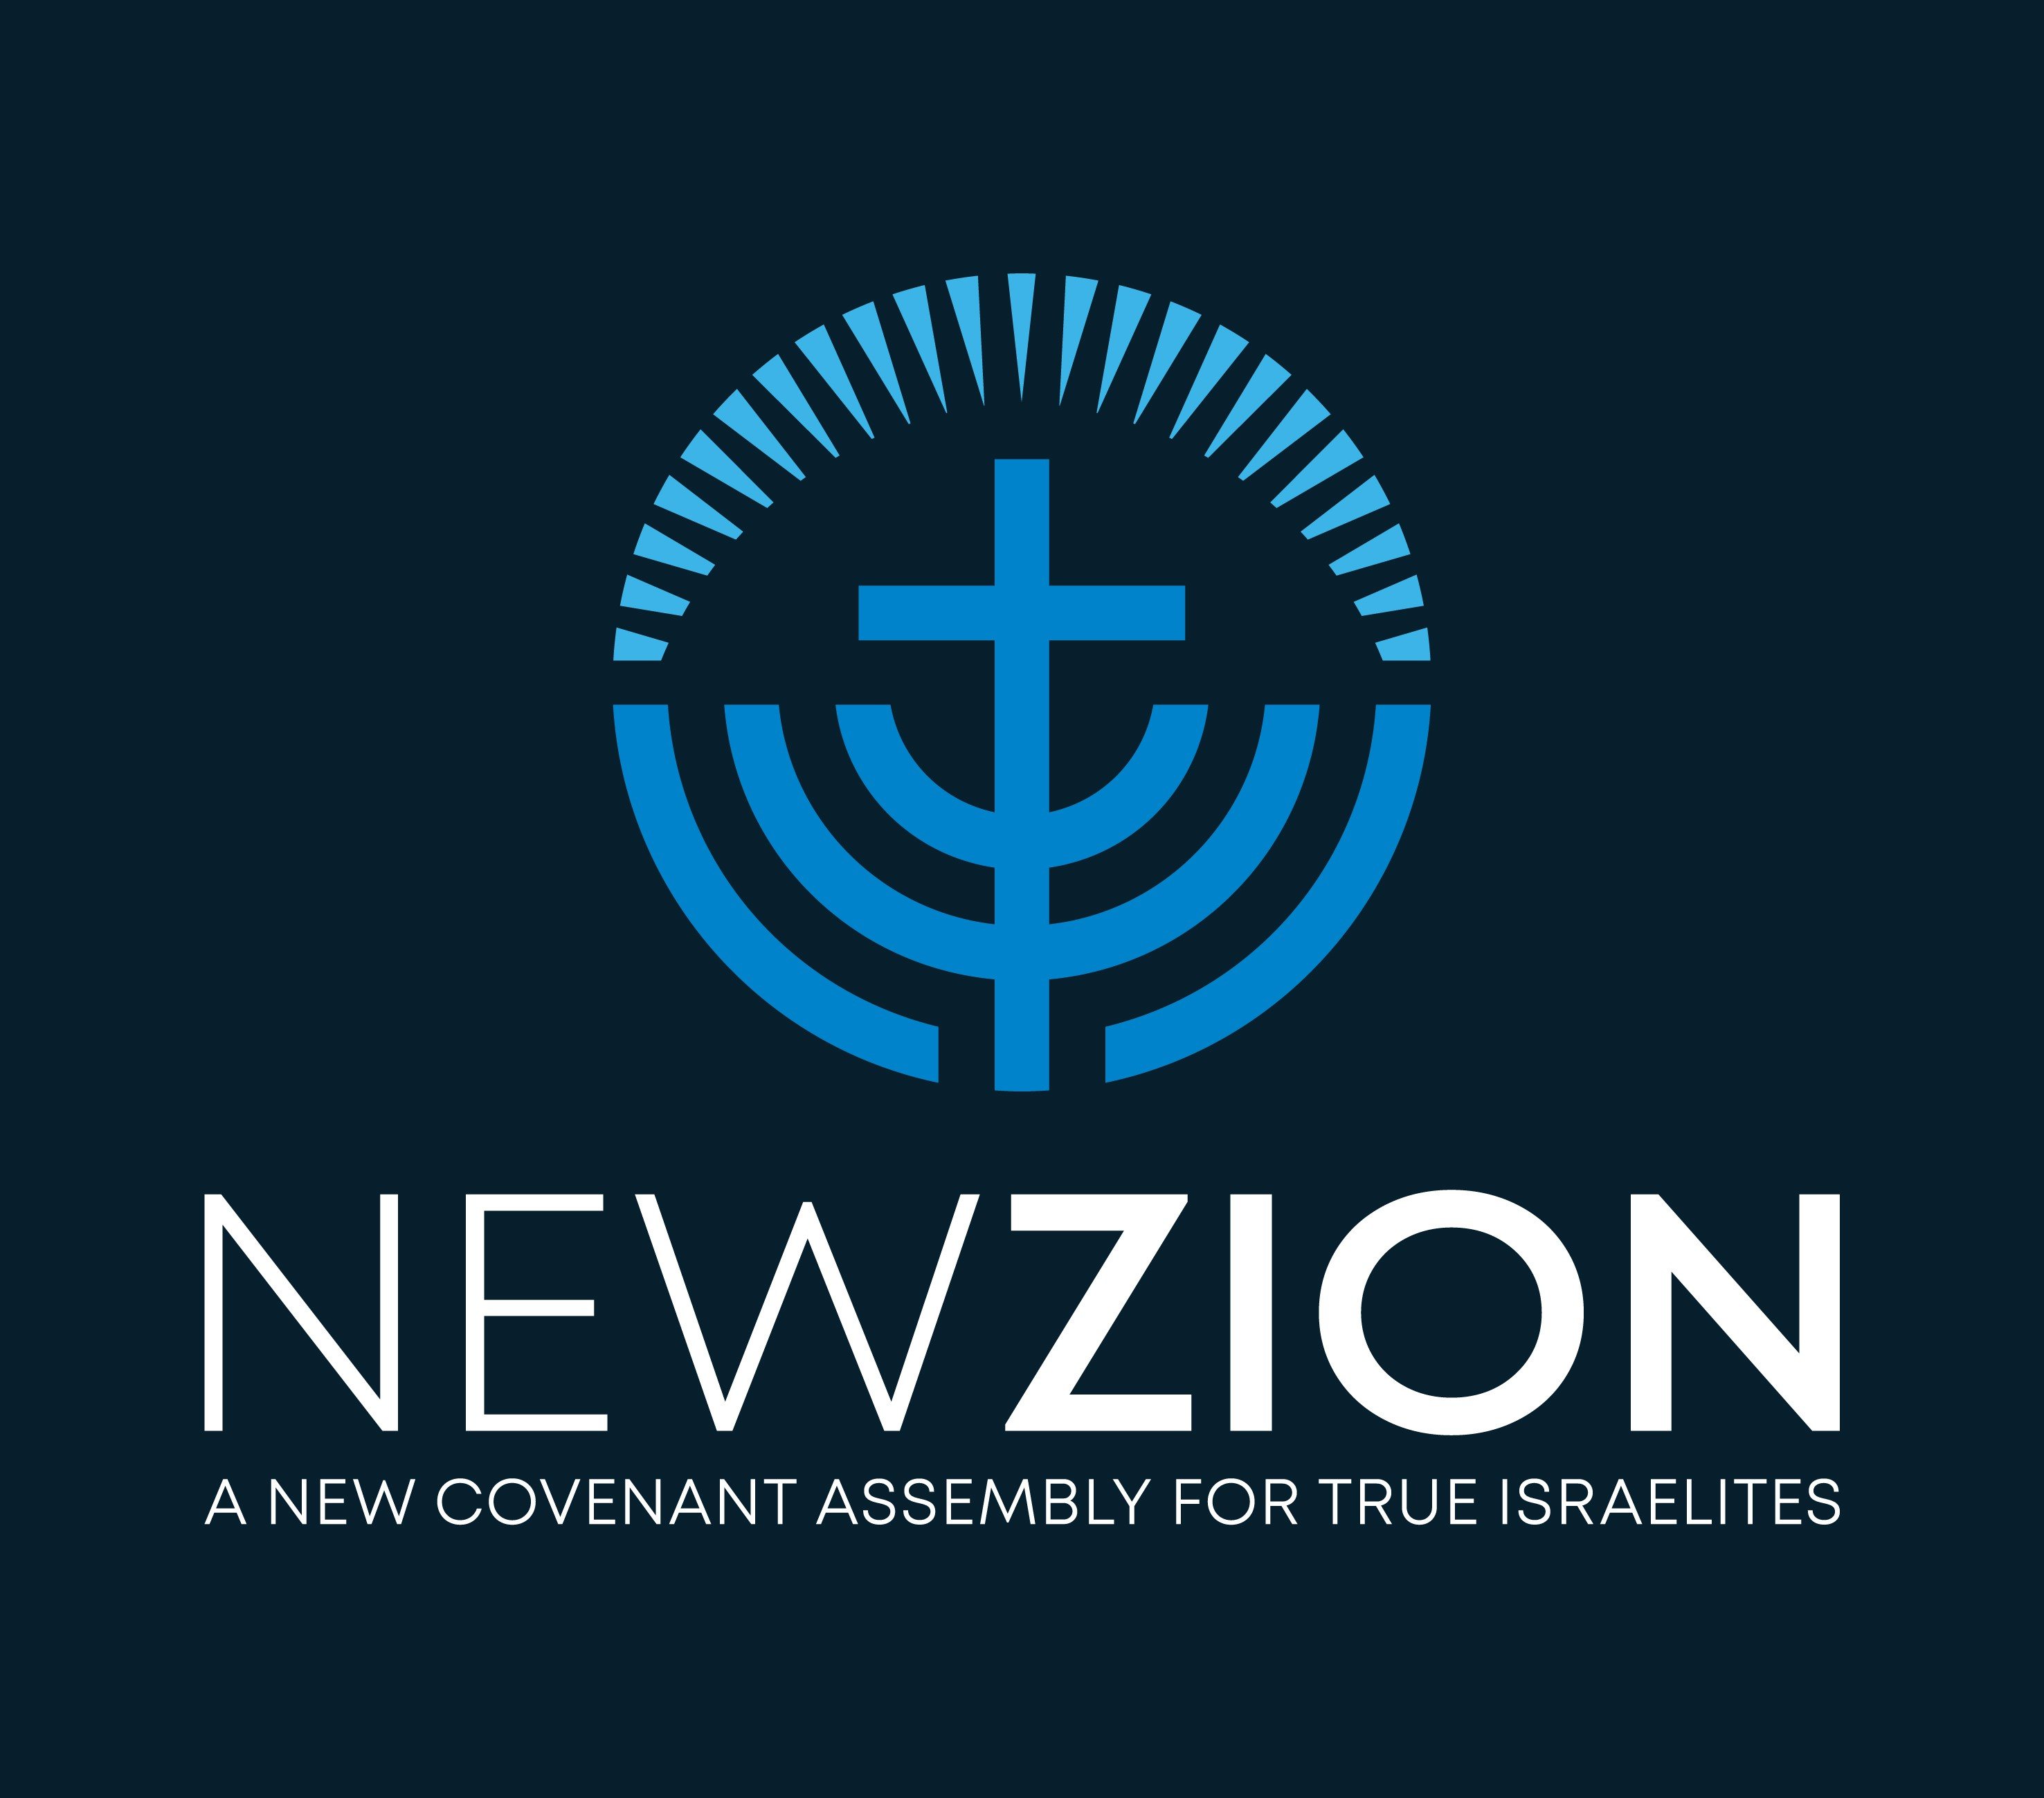 New Zion